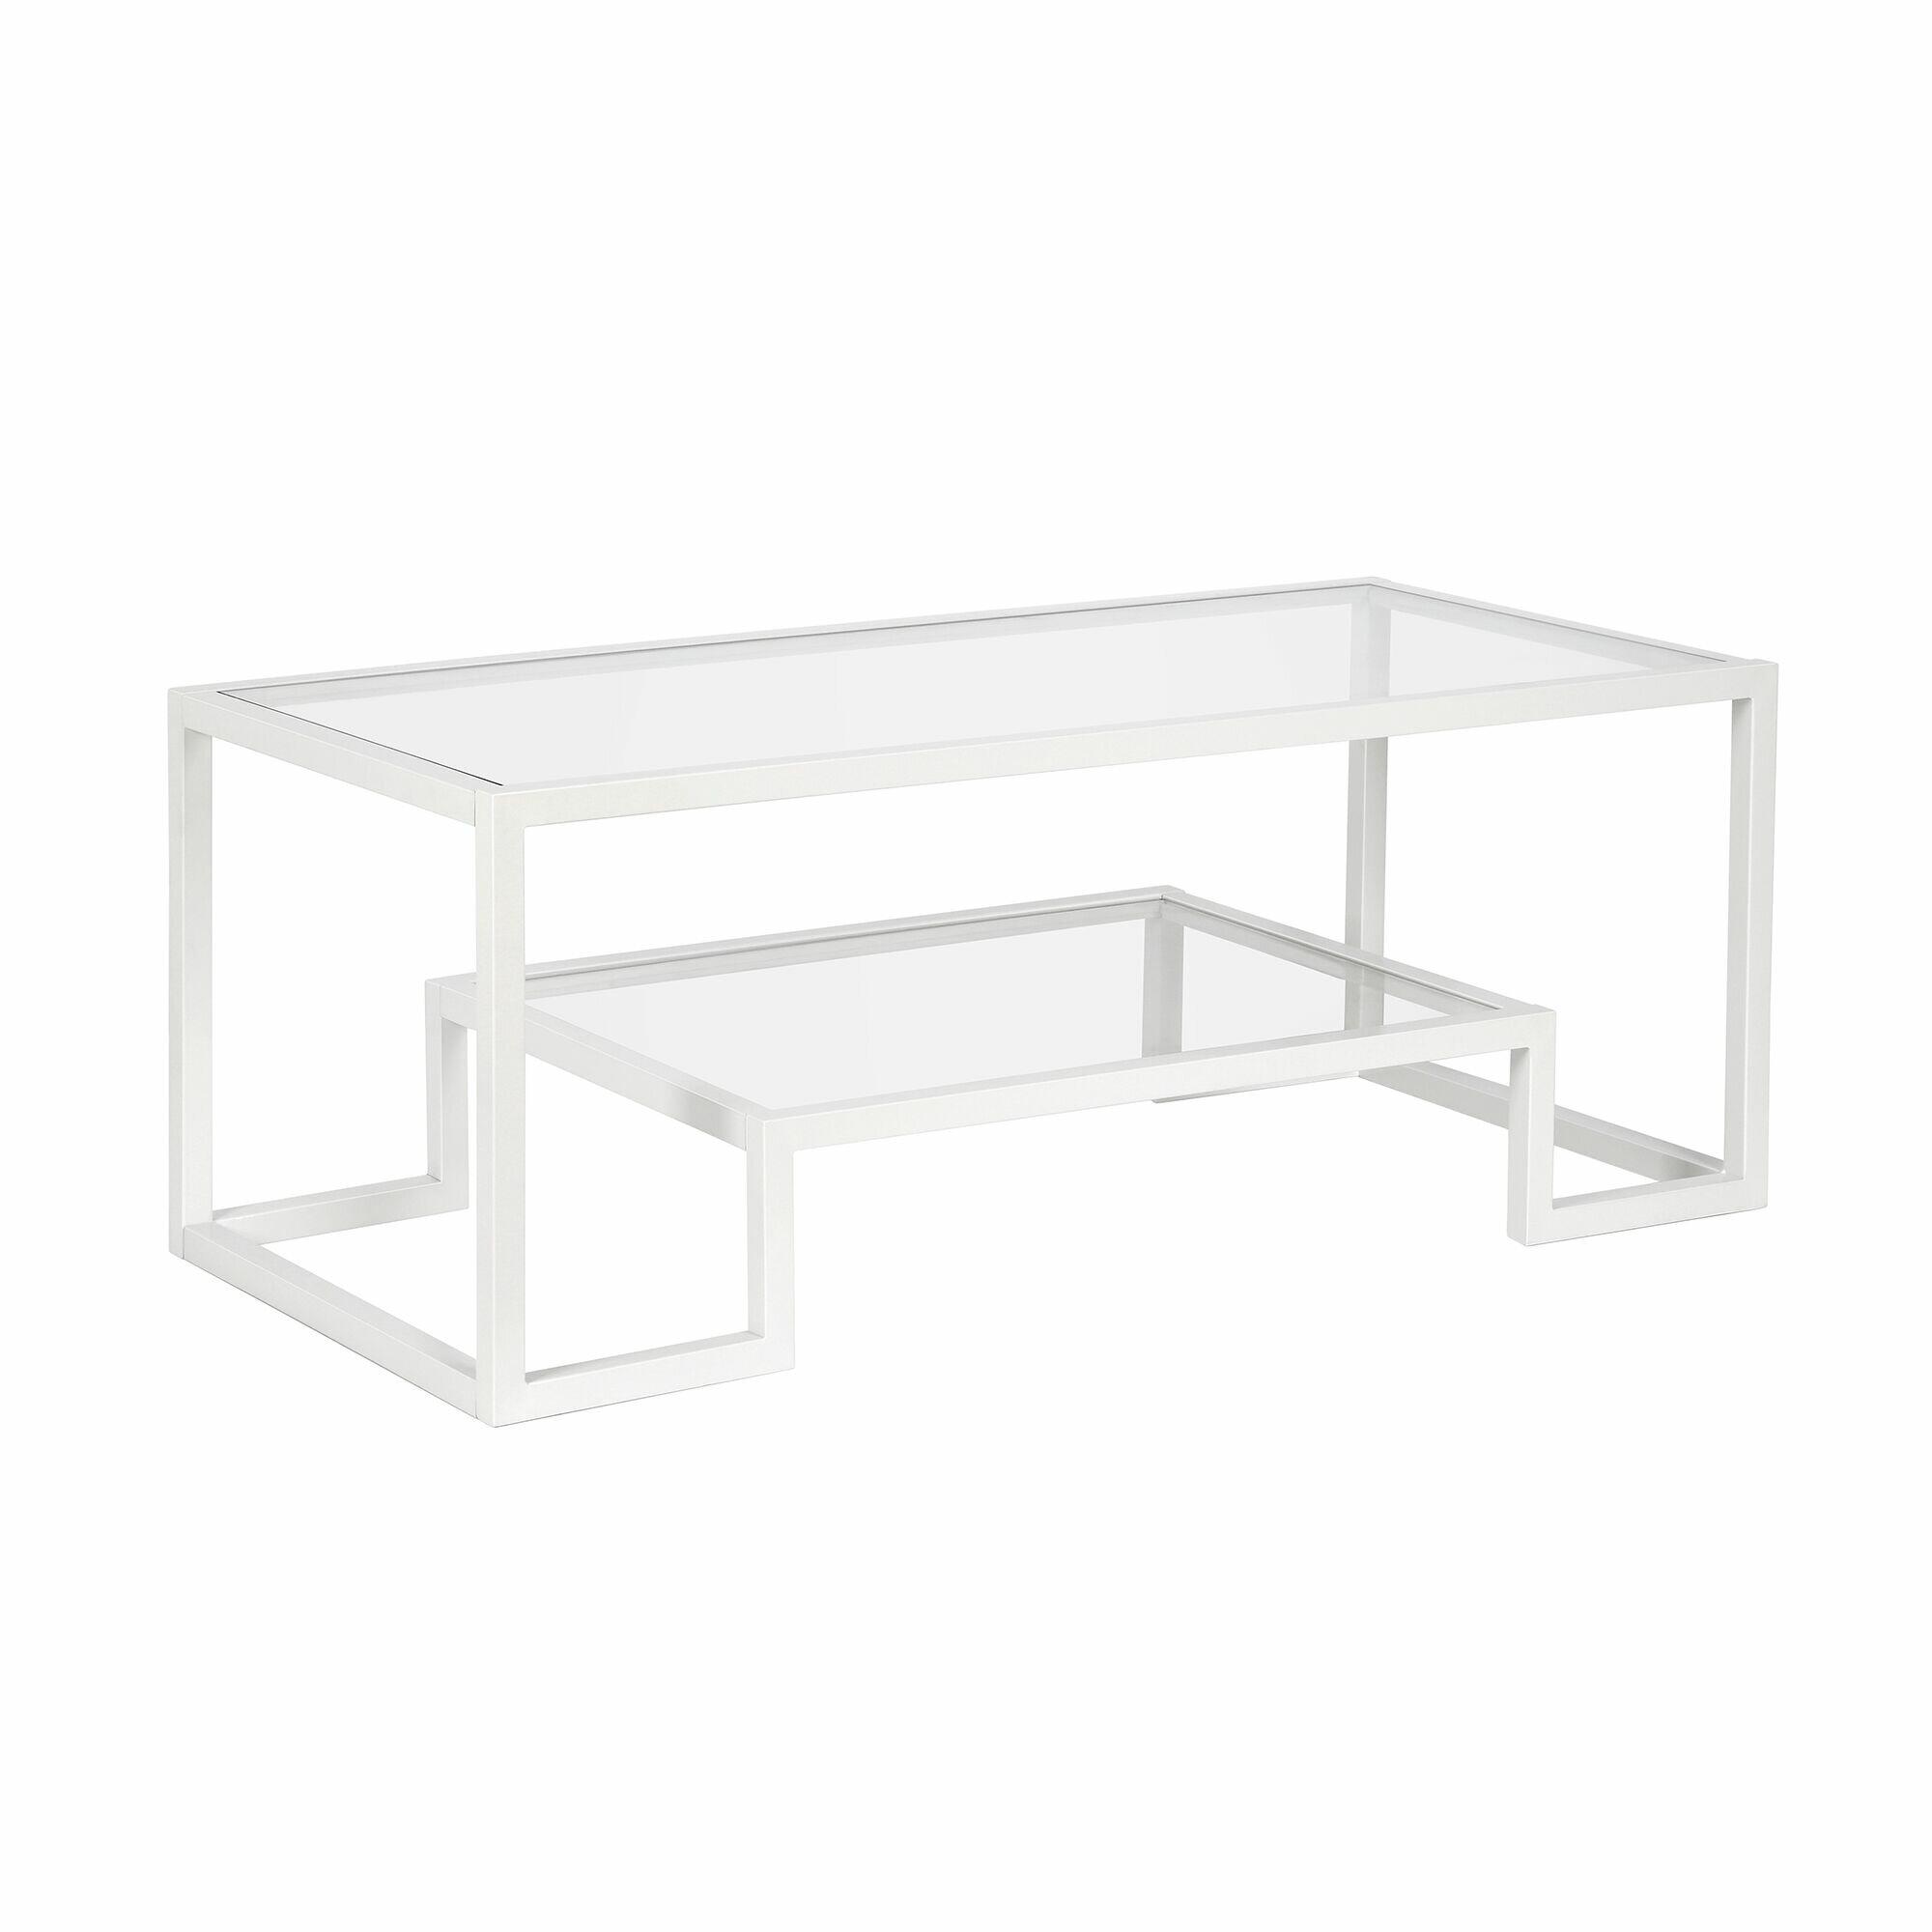 Mercer41 Imel Frame Coffee Table With Storage Reviews Wayfair